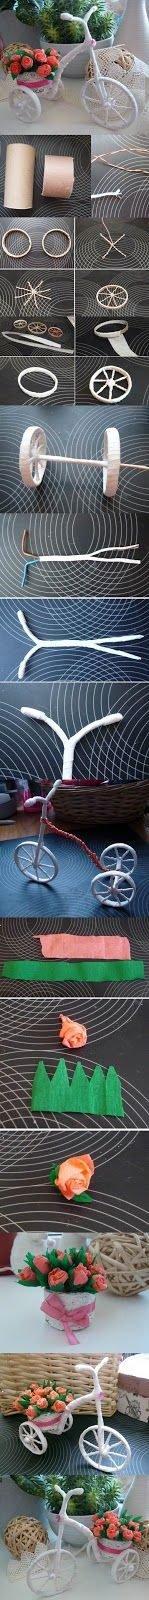 Adoro Artesanato: Bicicletinha linda